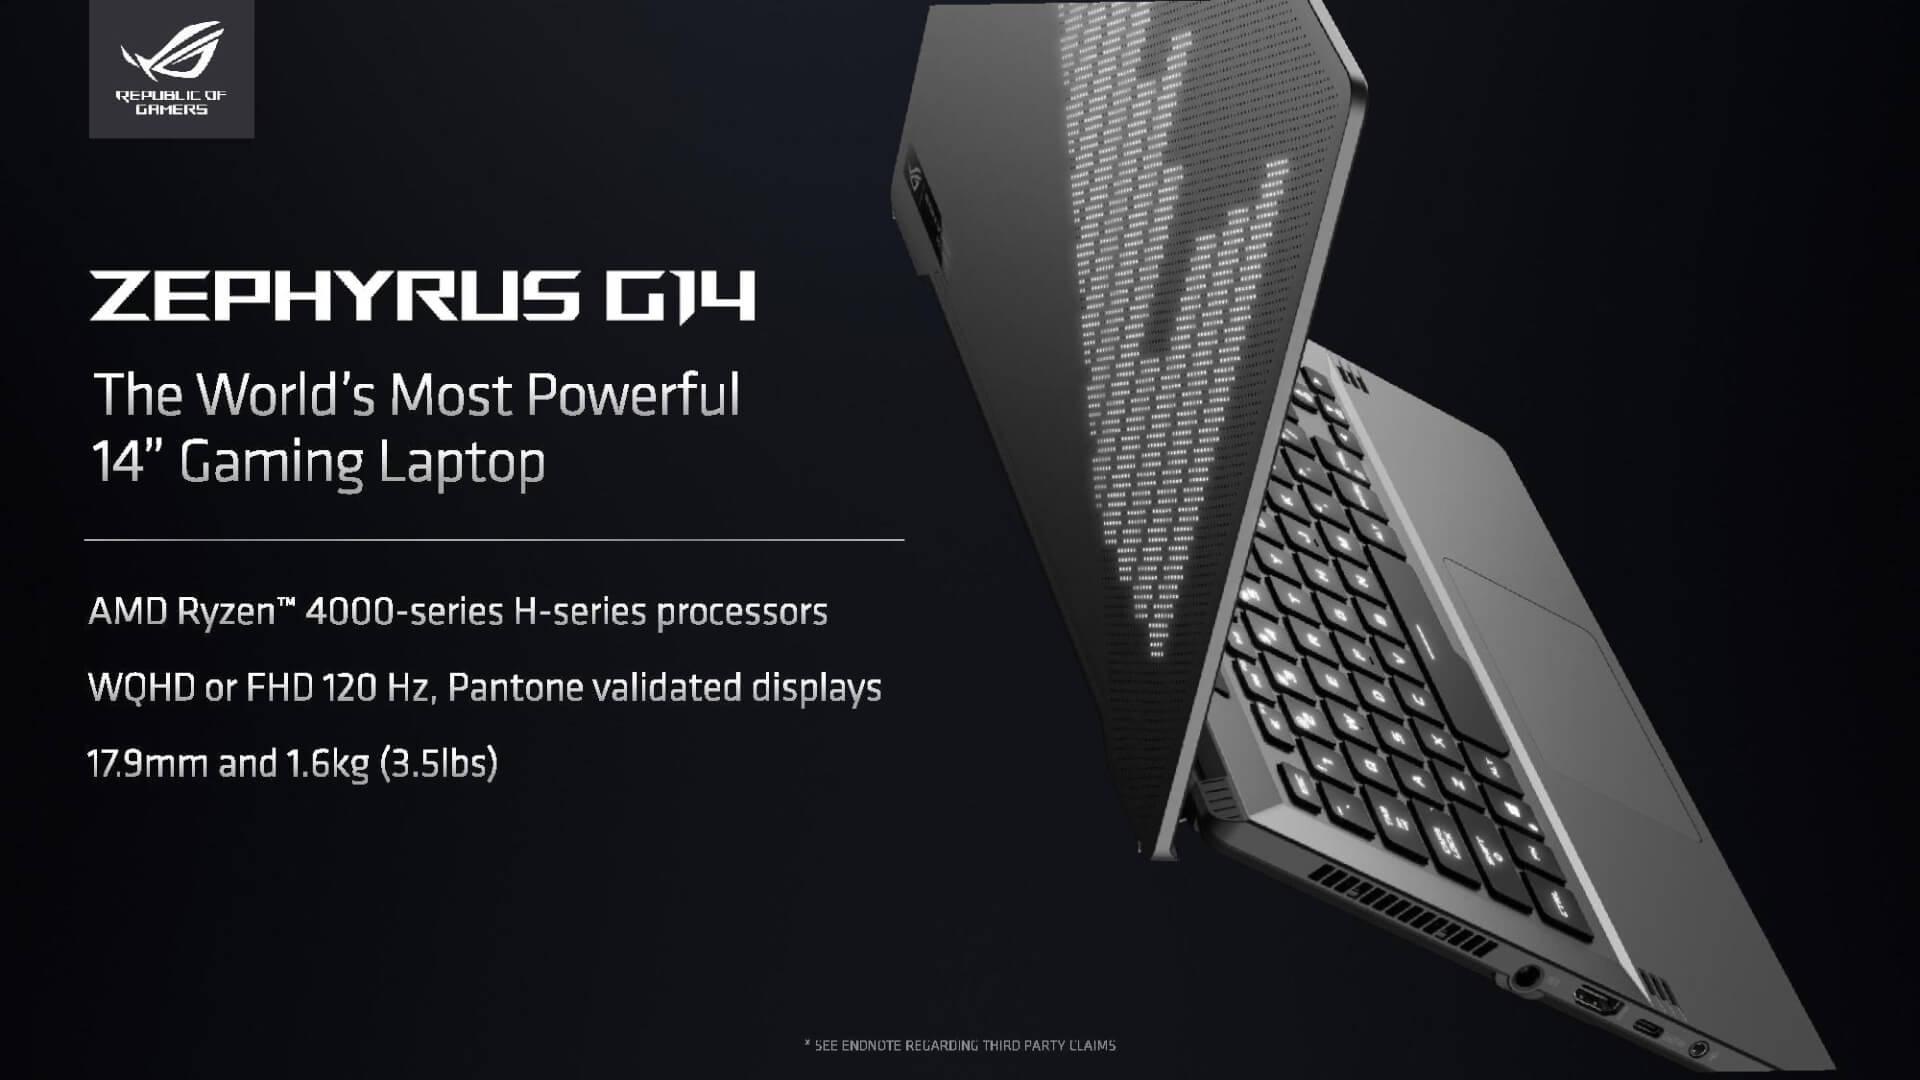 Amd Ryzen 5 4600h Vs Ryzen 7 4800hs Vs Intel Core I7 10750h Performance Benchmarks Hardware Times